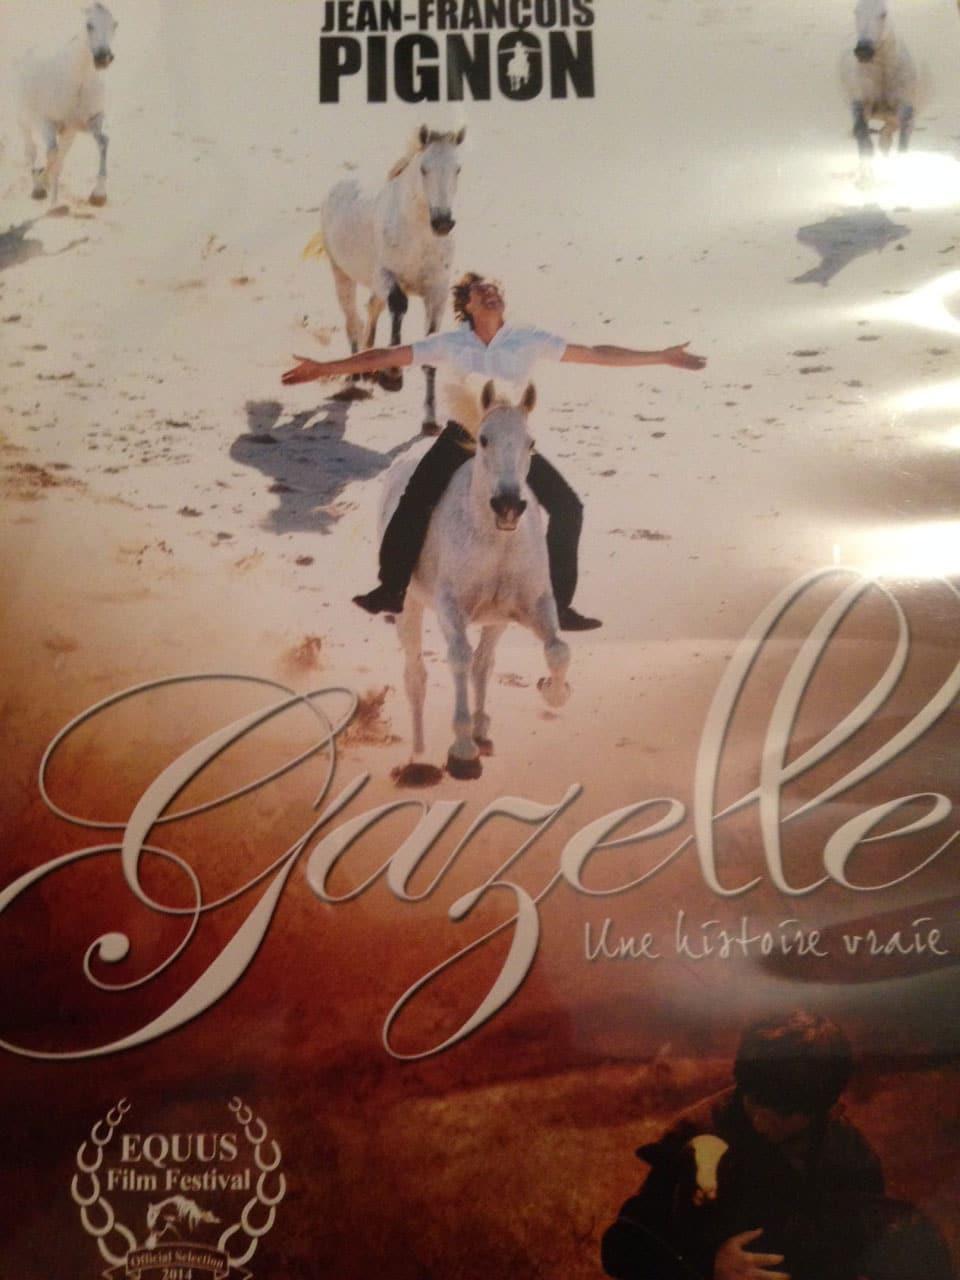 gazelle film de pignon